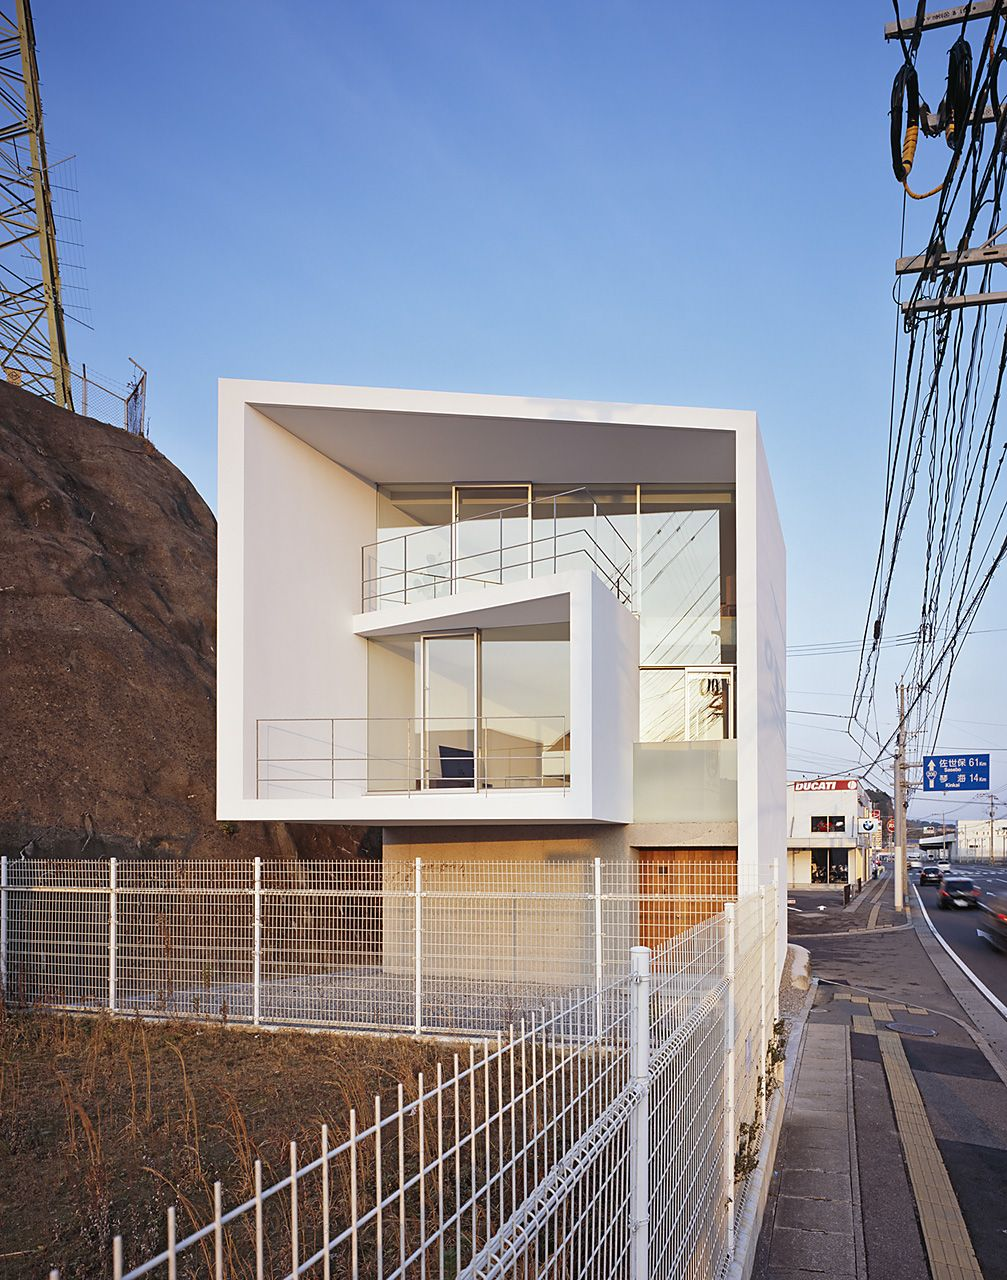 Pin de samuel aguas en architecture pinterest for Minimalismo moderno